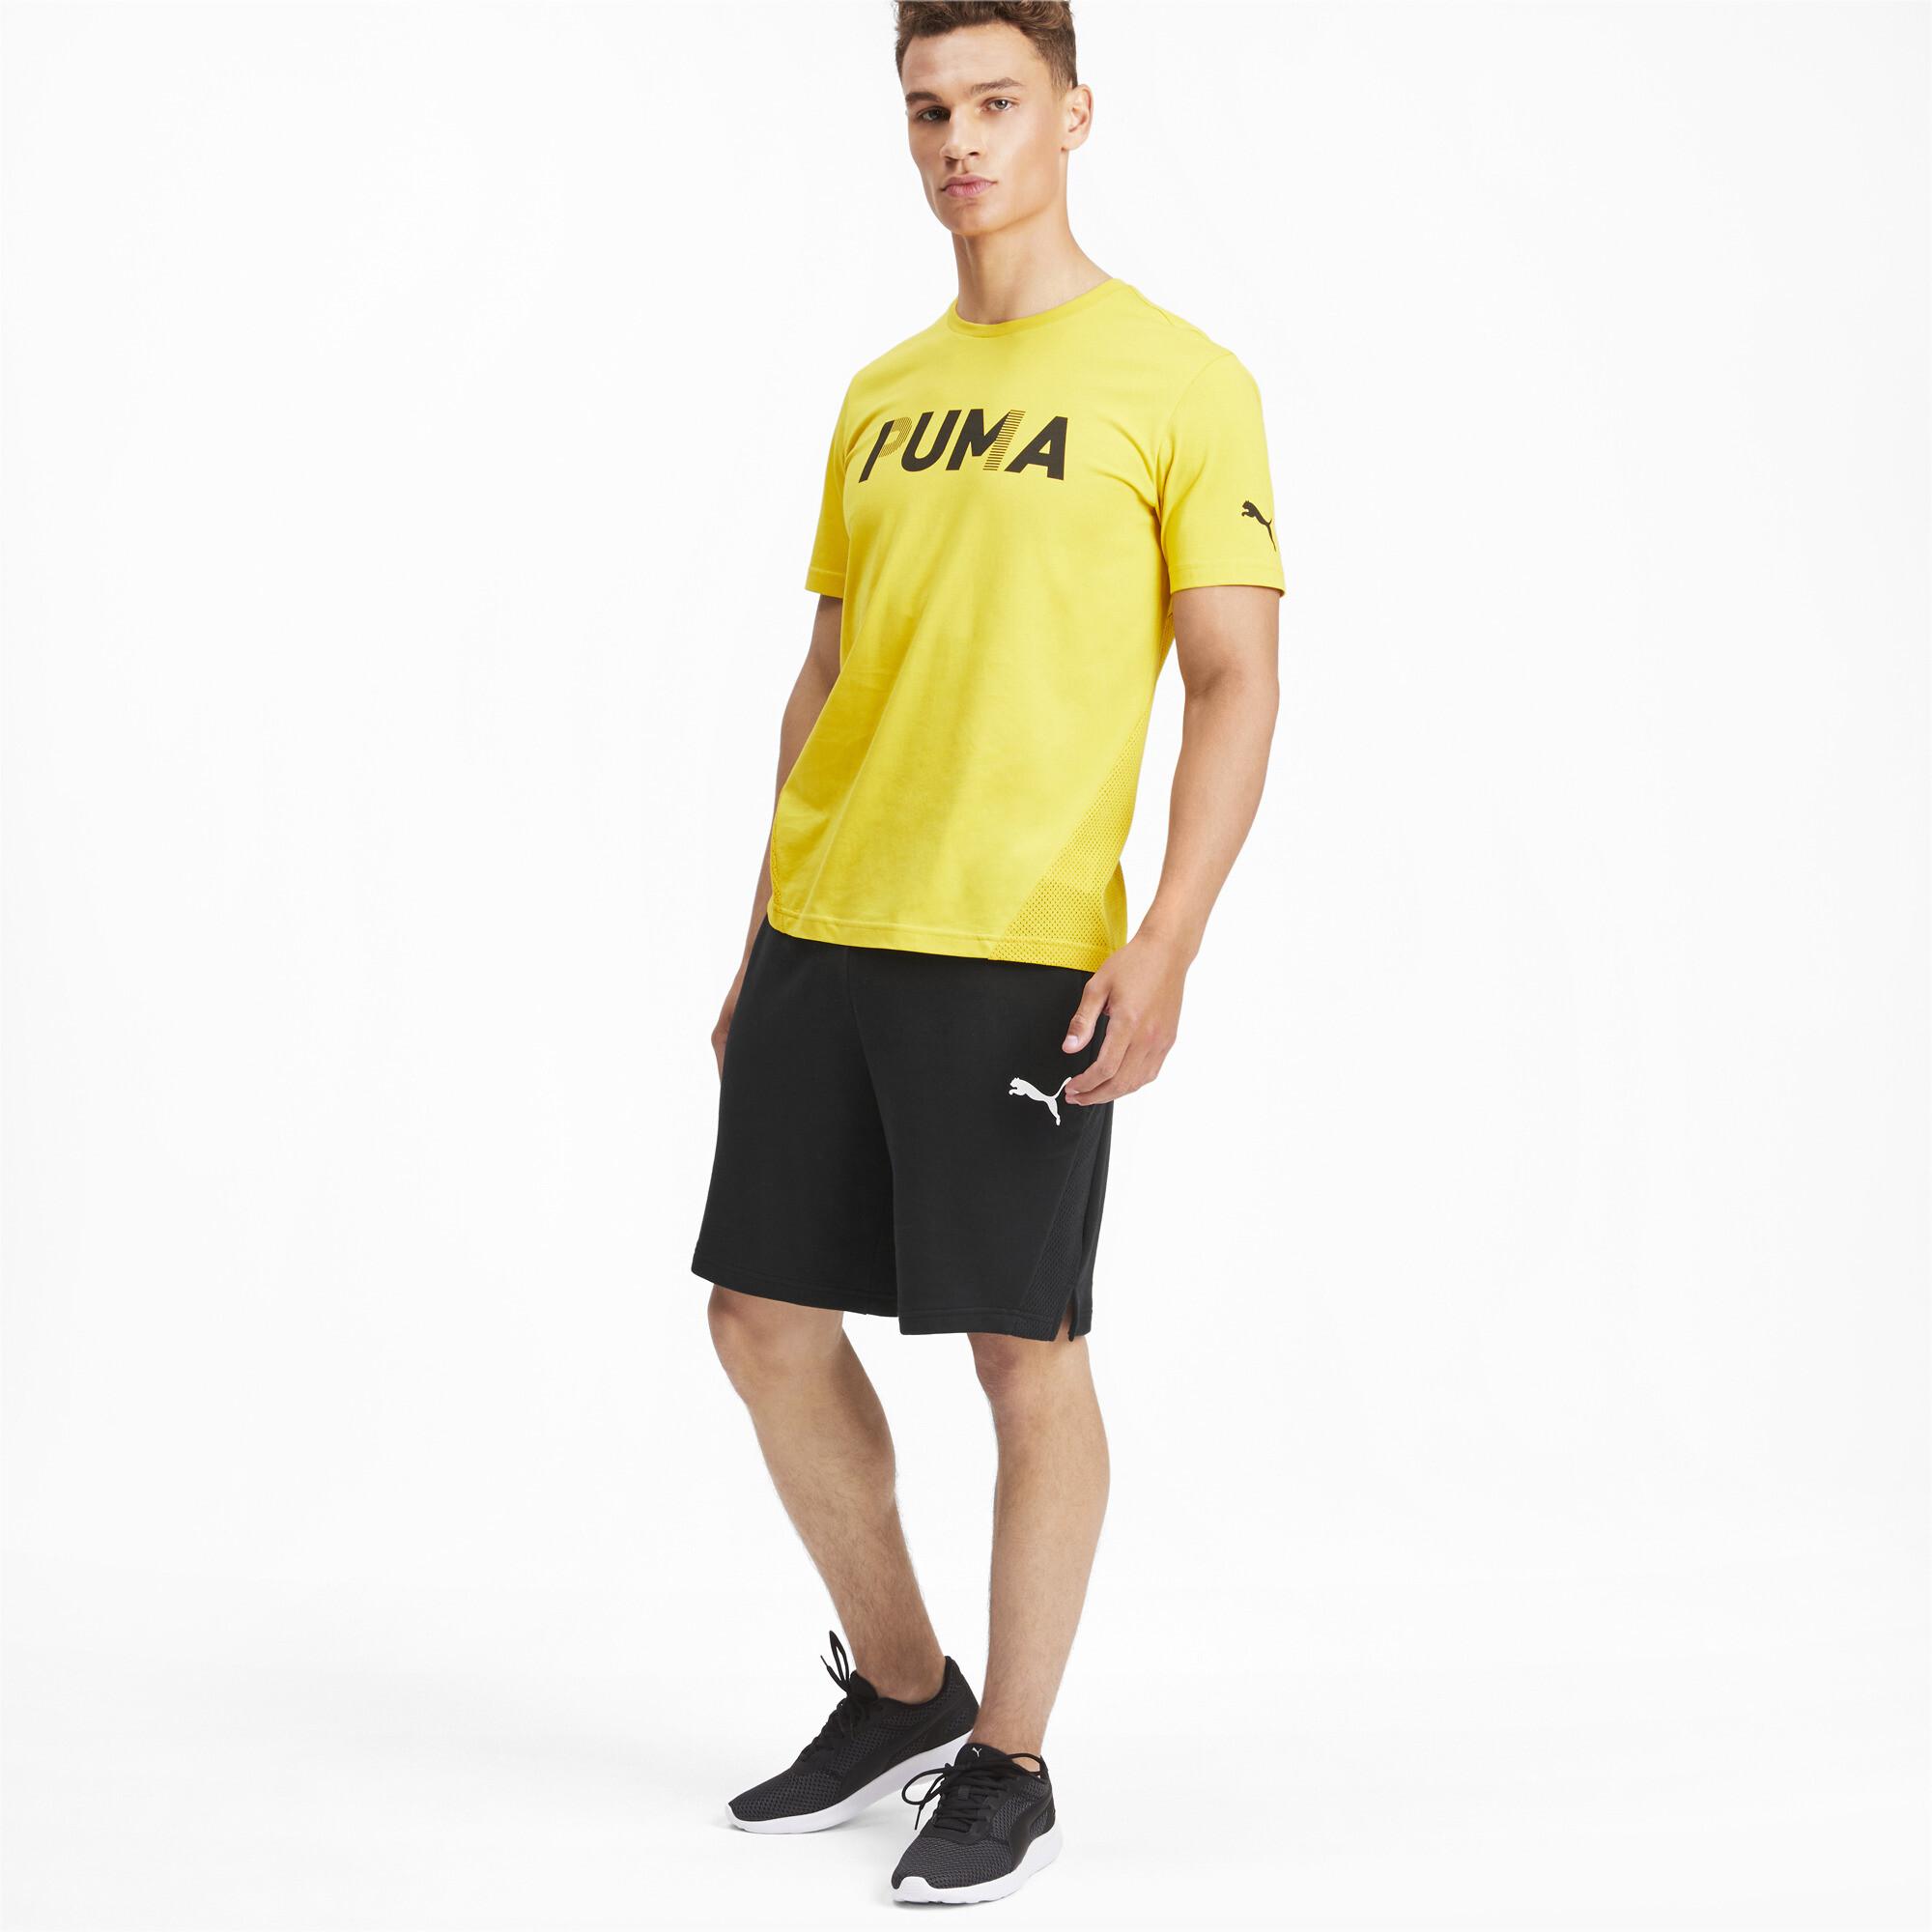 PUMA-Modern-Sports-Men-039-s-Shorts-Men-Knitted-Shorts-Basics thumbnail 6